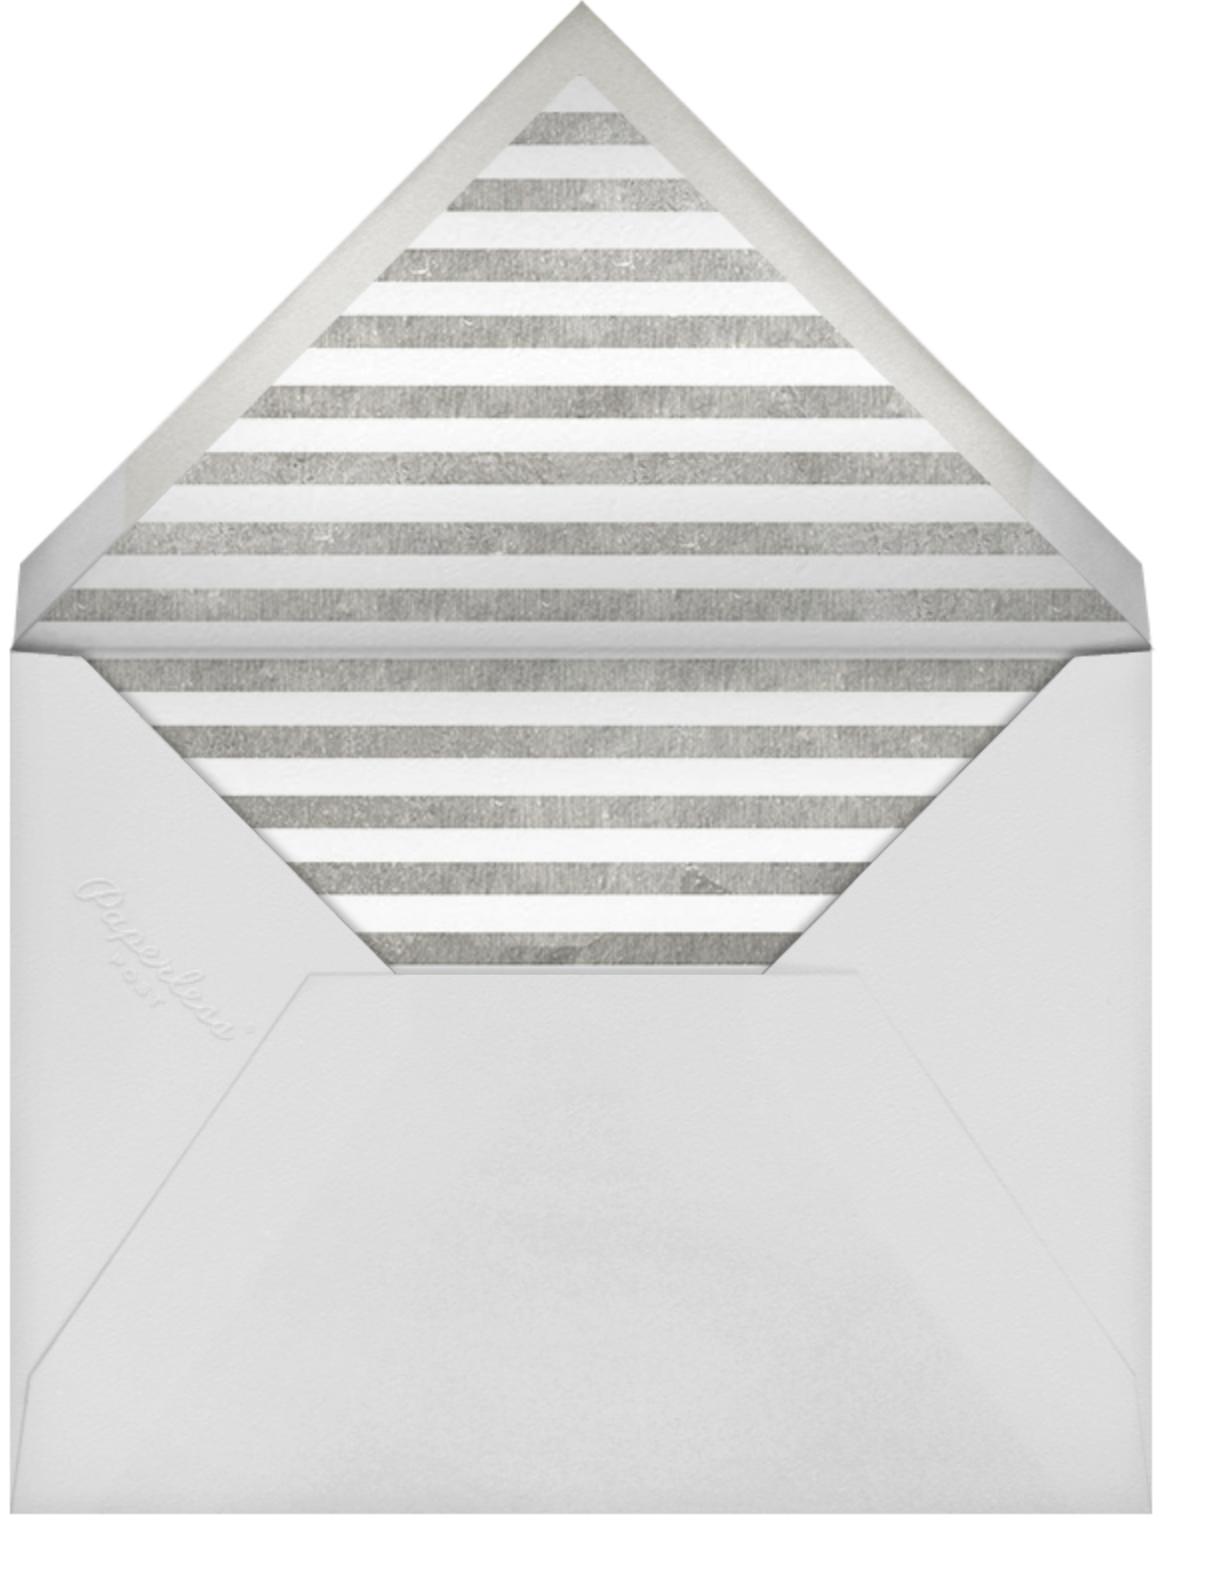 Classic Vintage - Silver/Black - kate spade new york - Engagement party - envelope back